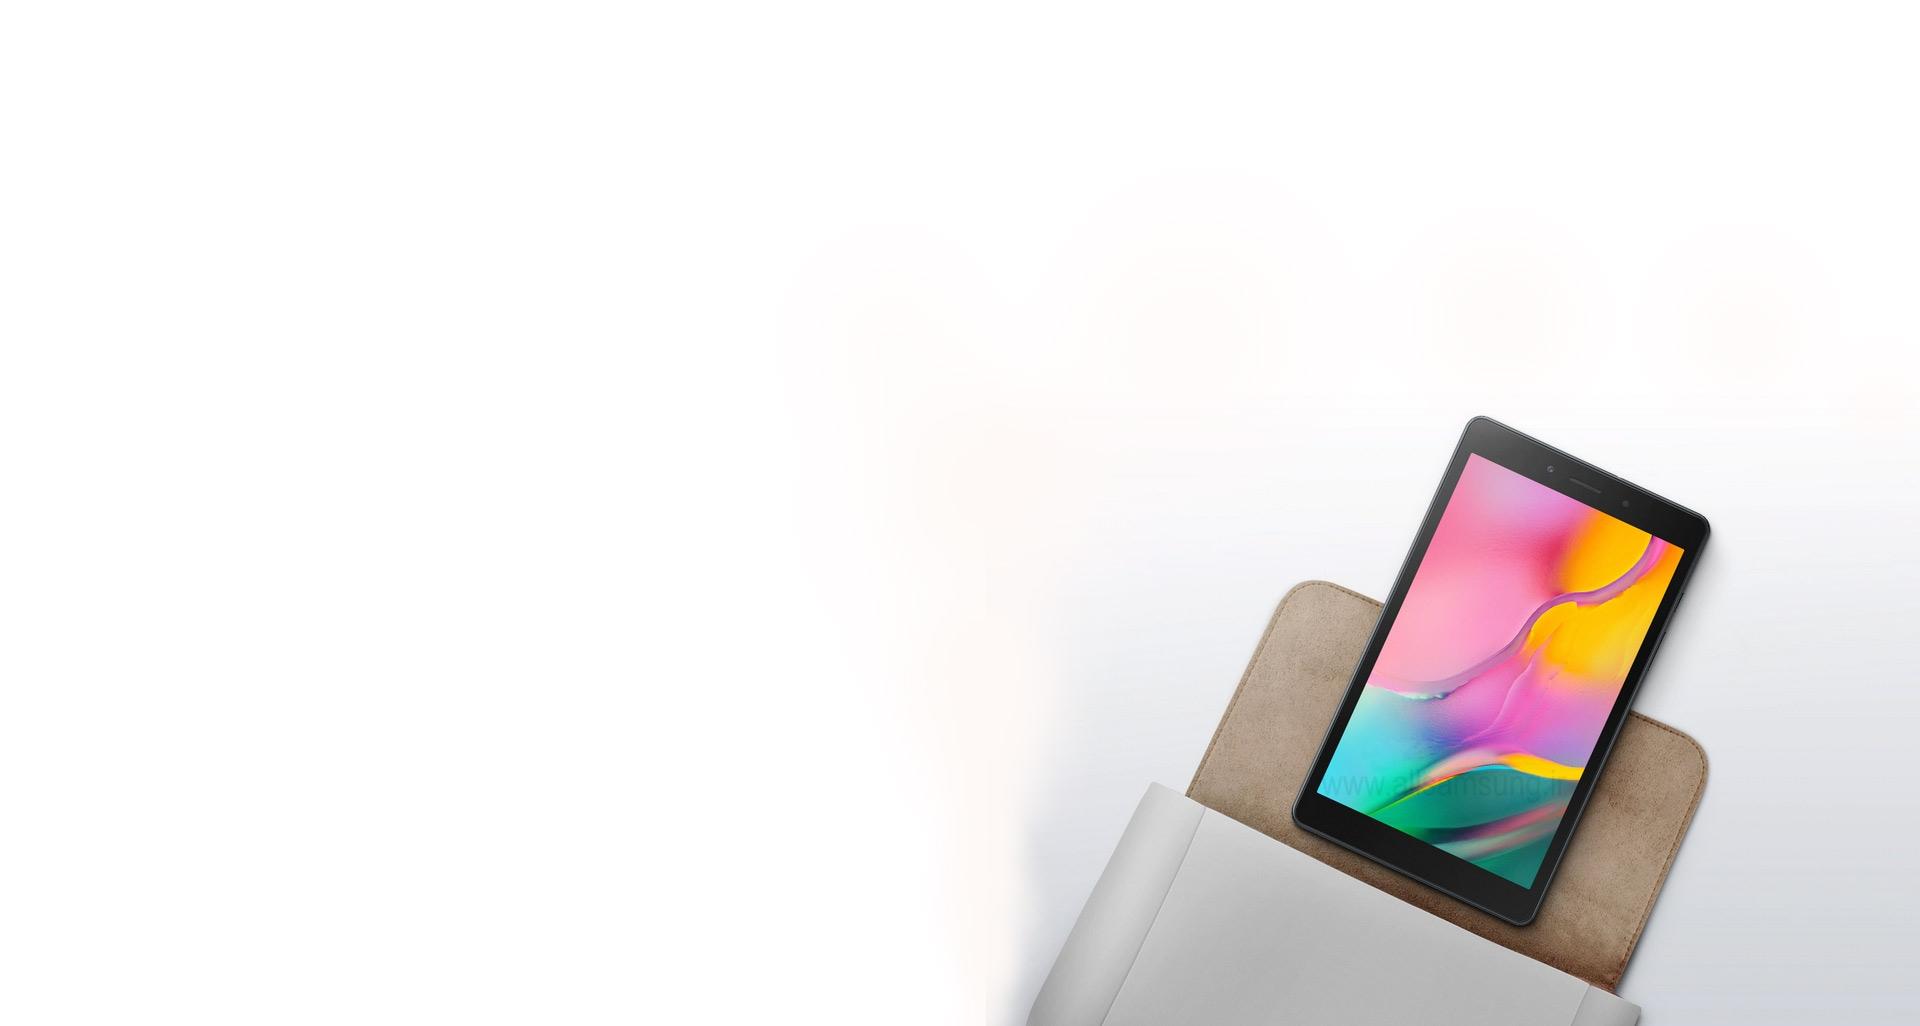 تبلت سامسونگ galaxy tab a 8.0 2019 مدل t295